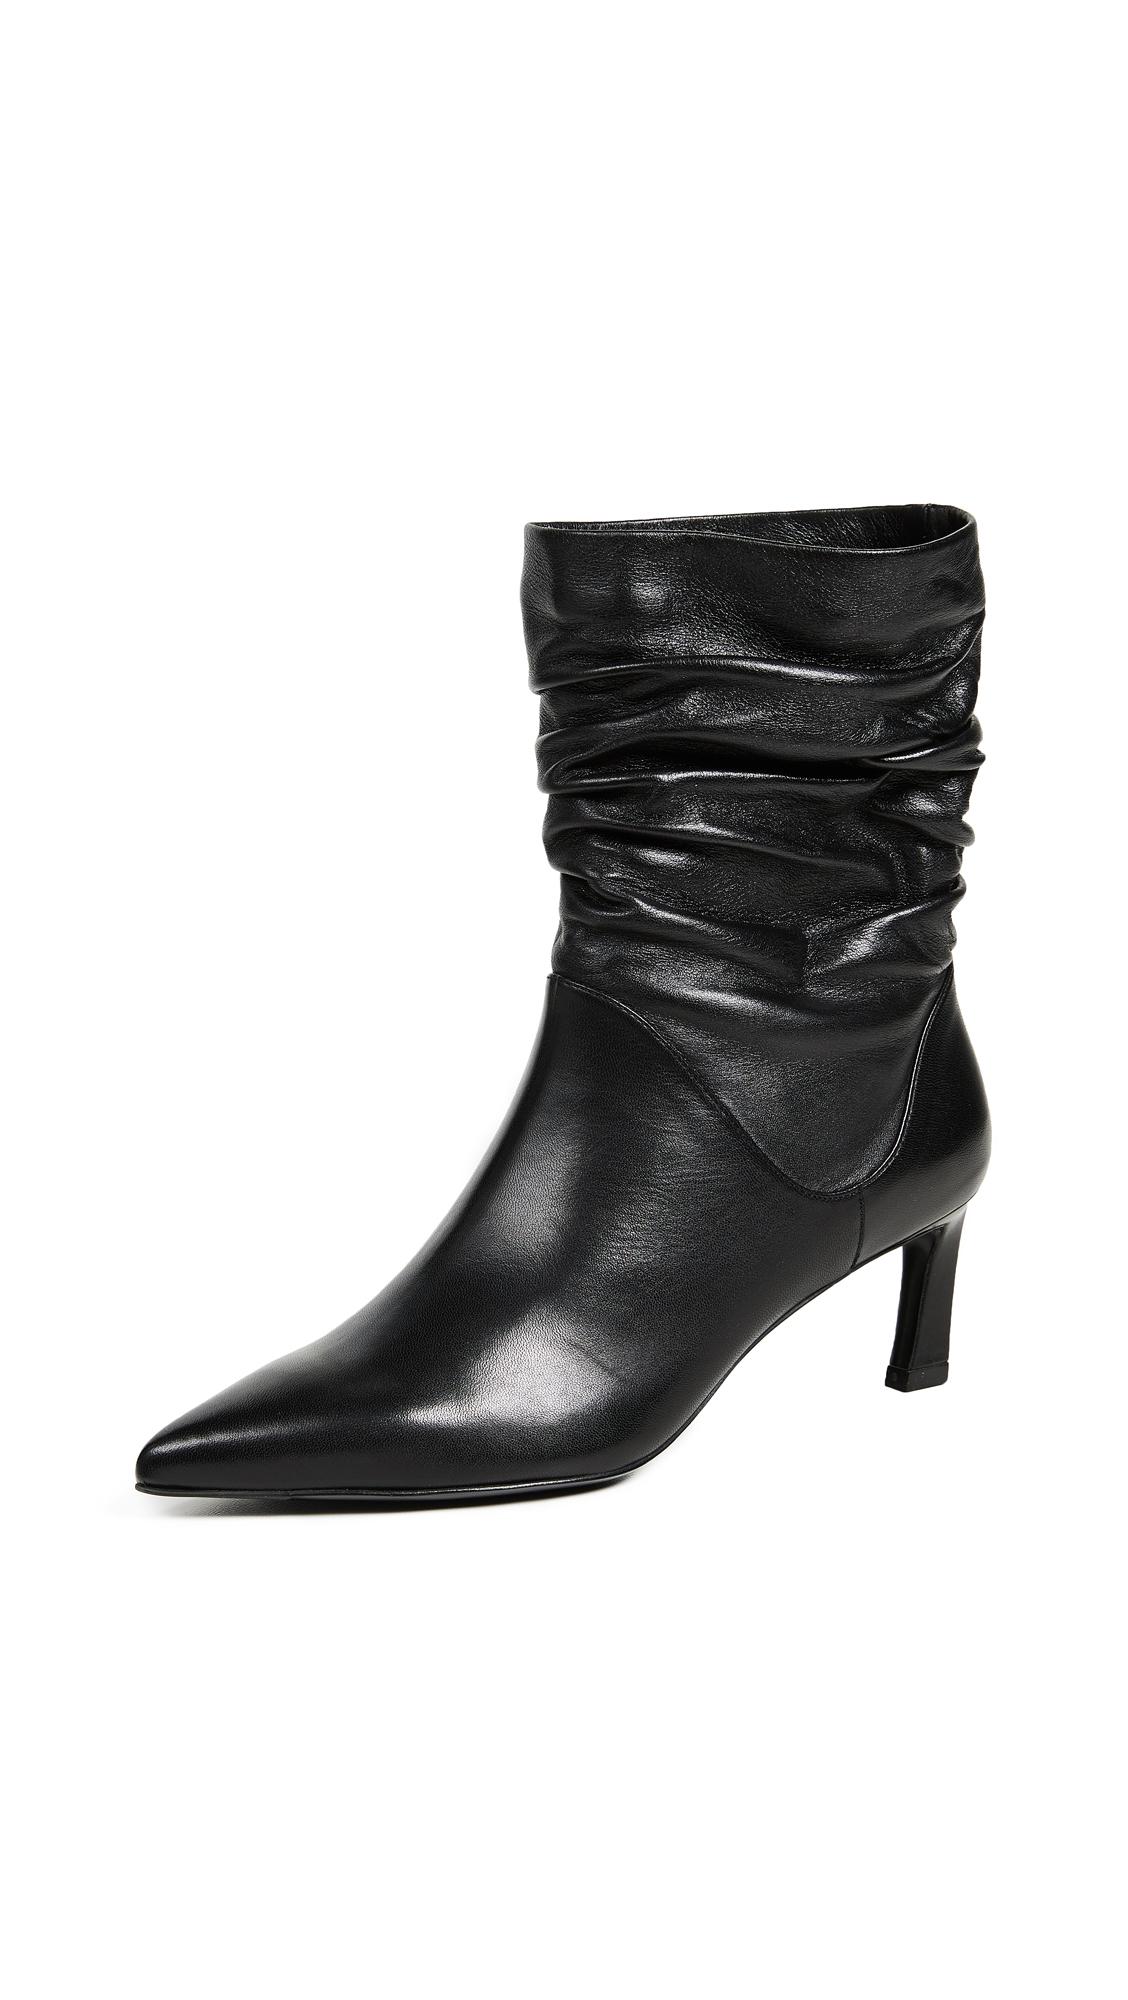 Stuart Weitzman Demibenatar Scrunch Boots - Black